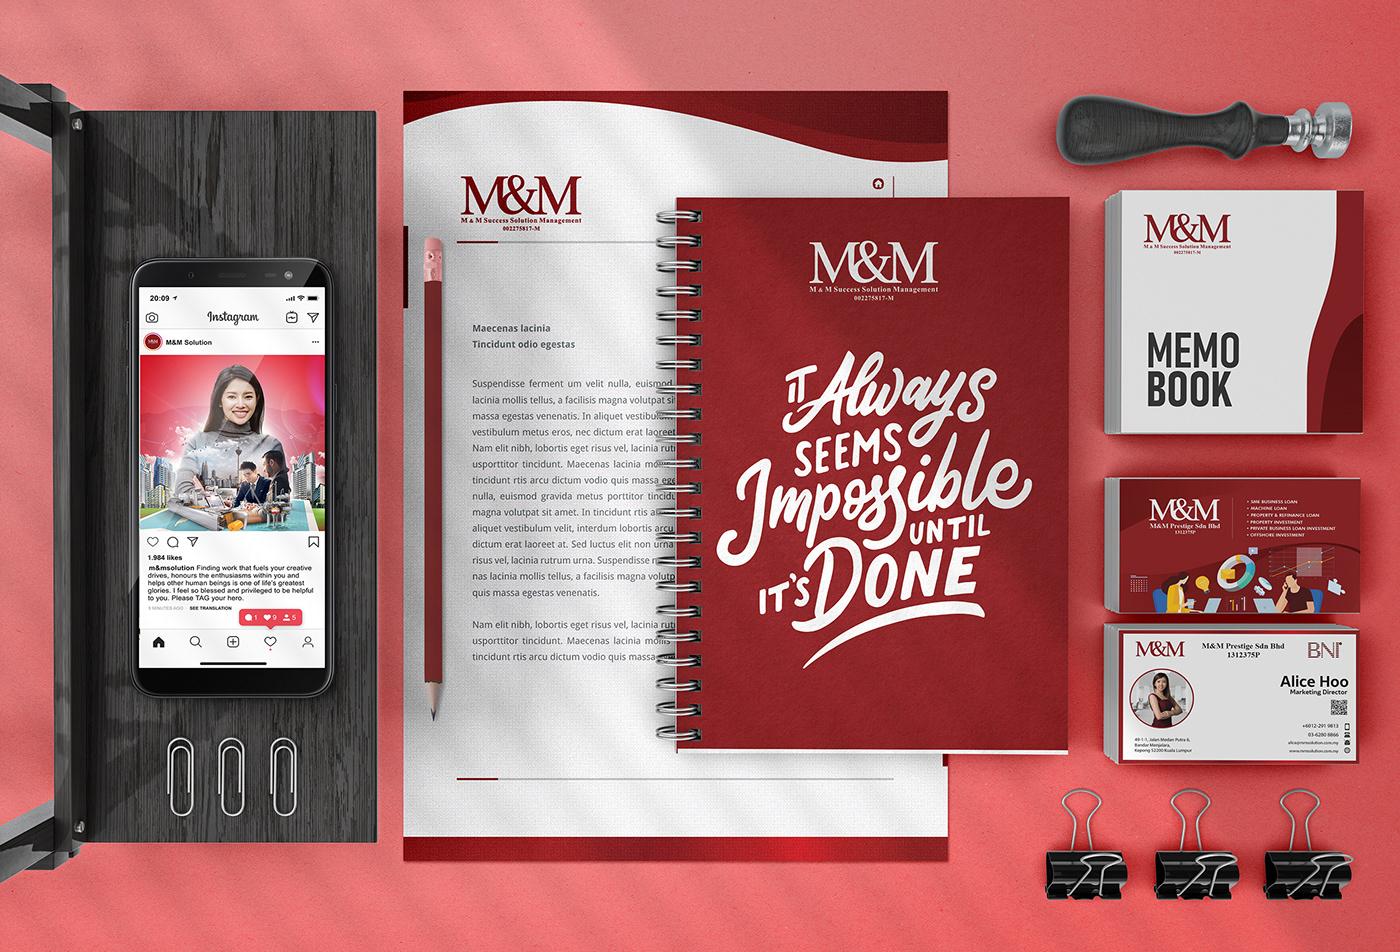 Image may contain: poster, menu and book